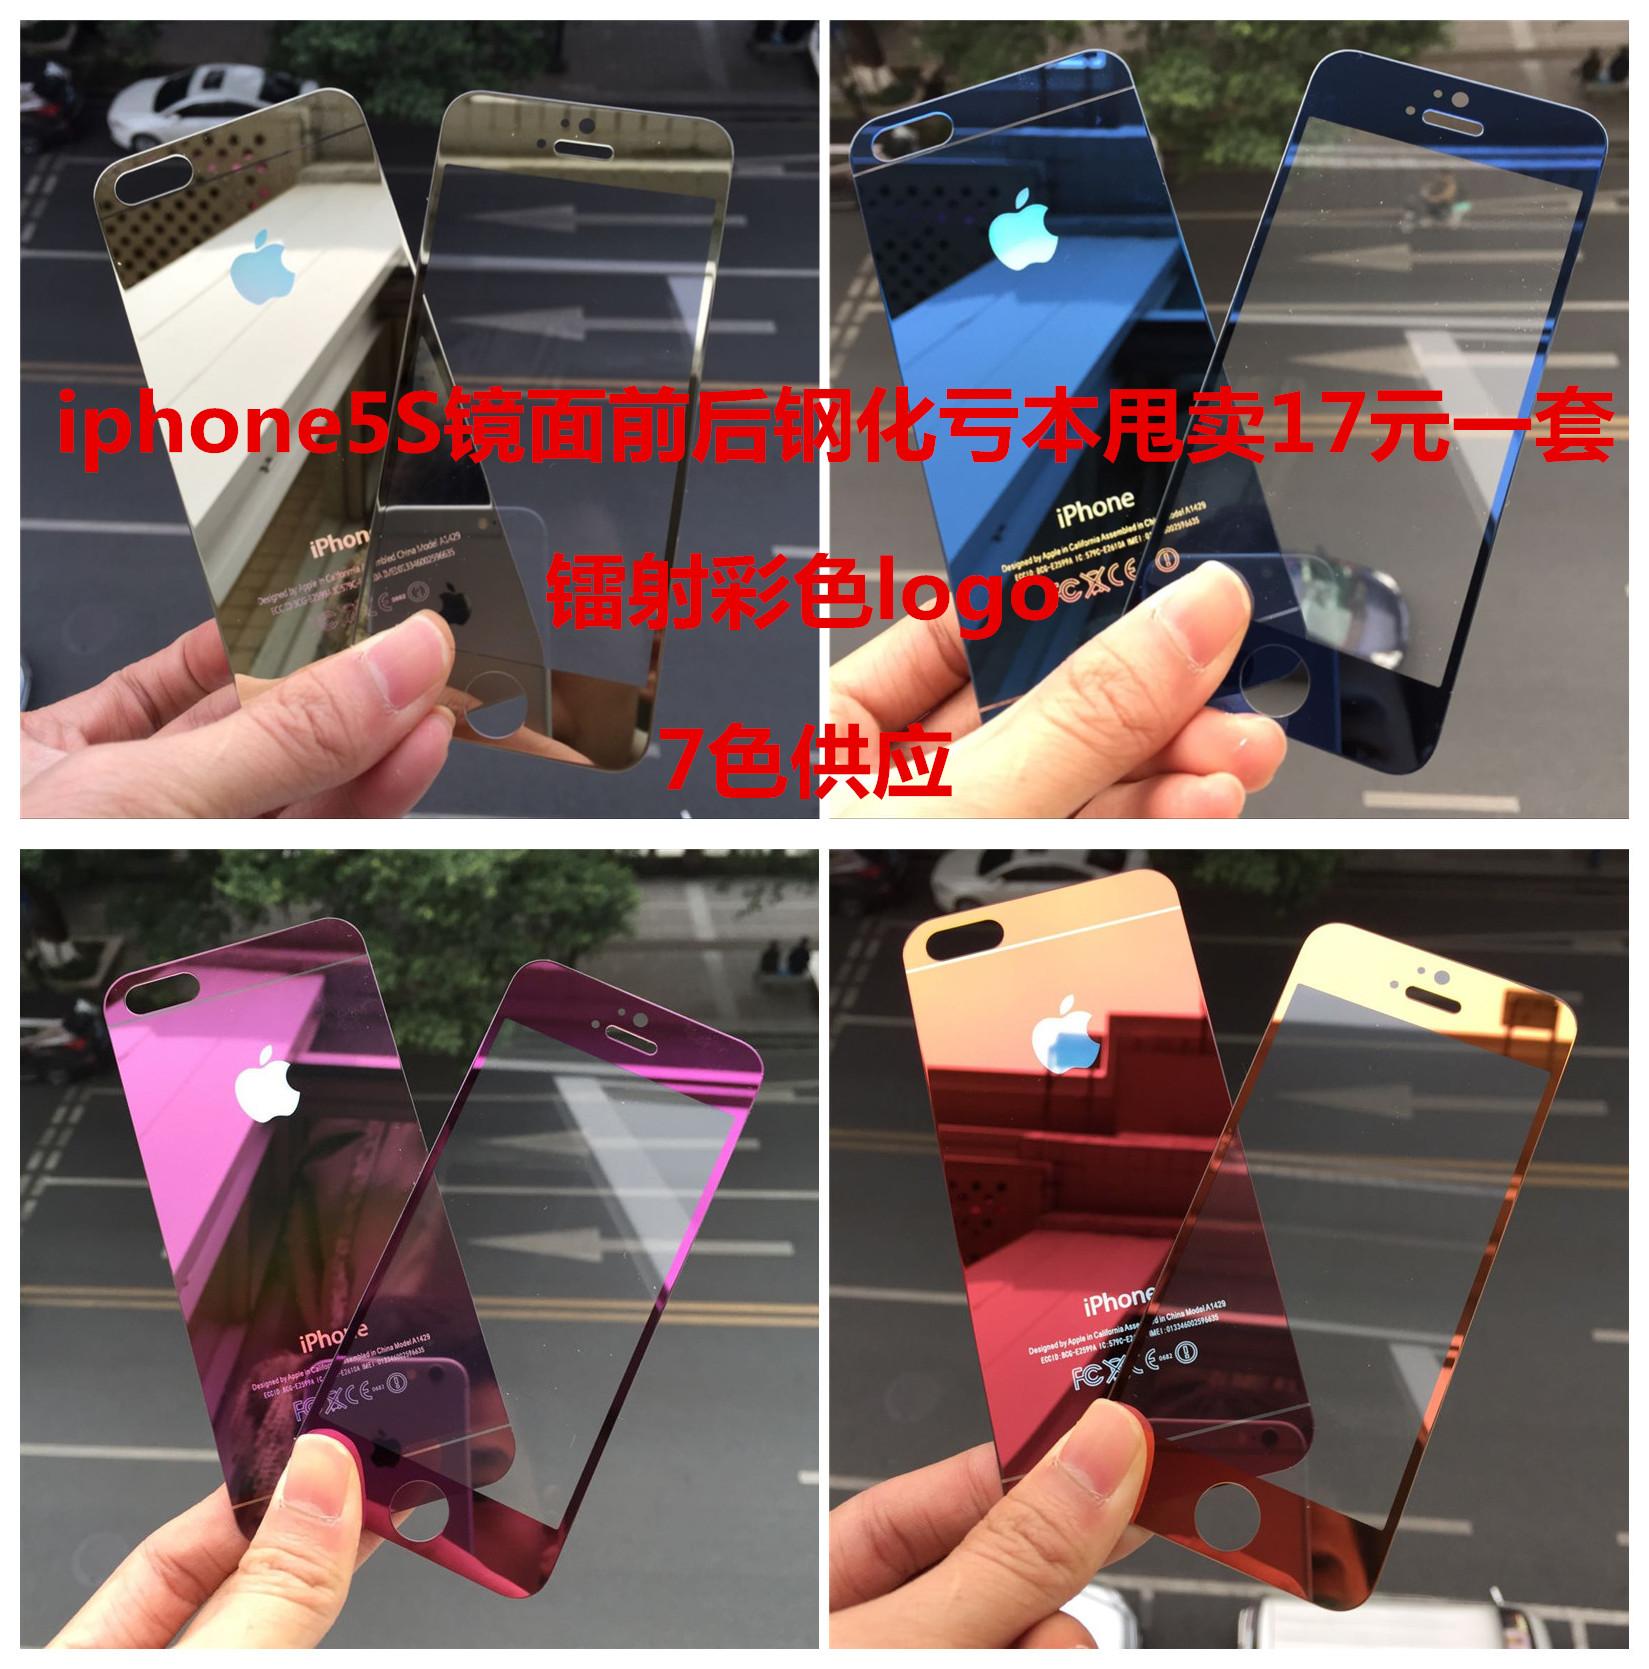 Apple защитная плёнка для iPad Apple  Iphone5s 5S Iphone5 apple защитная плёнка для ipad iphone 4 sticker iphone4s adidas i4 iphone4s